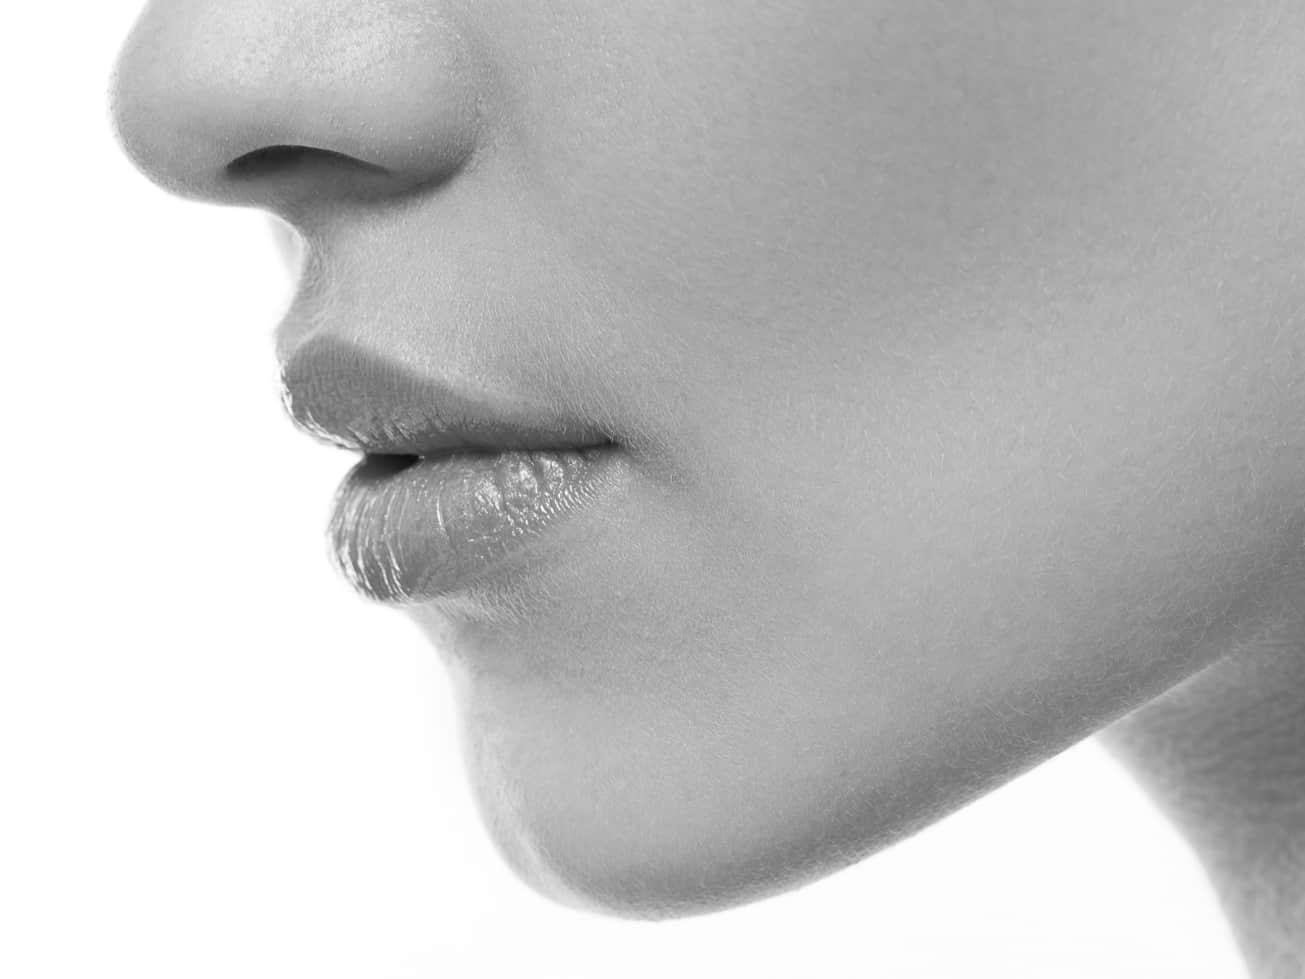 Closeup of Lips Enhanced by Plastic Surgery in Atlanta